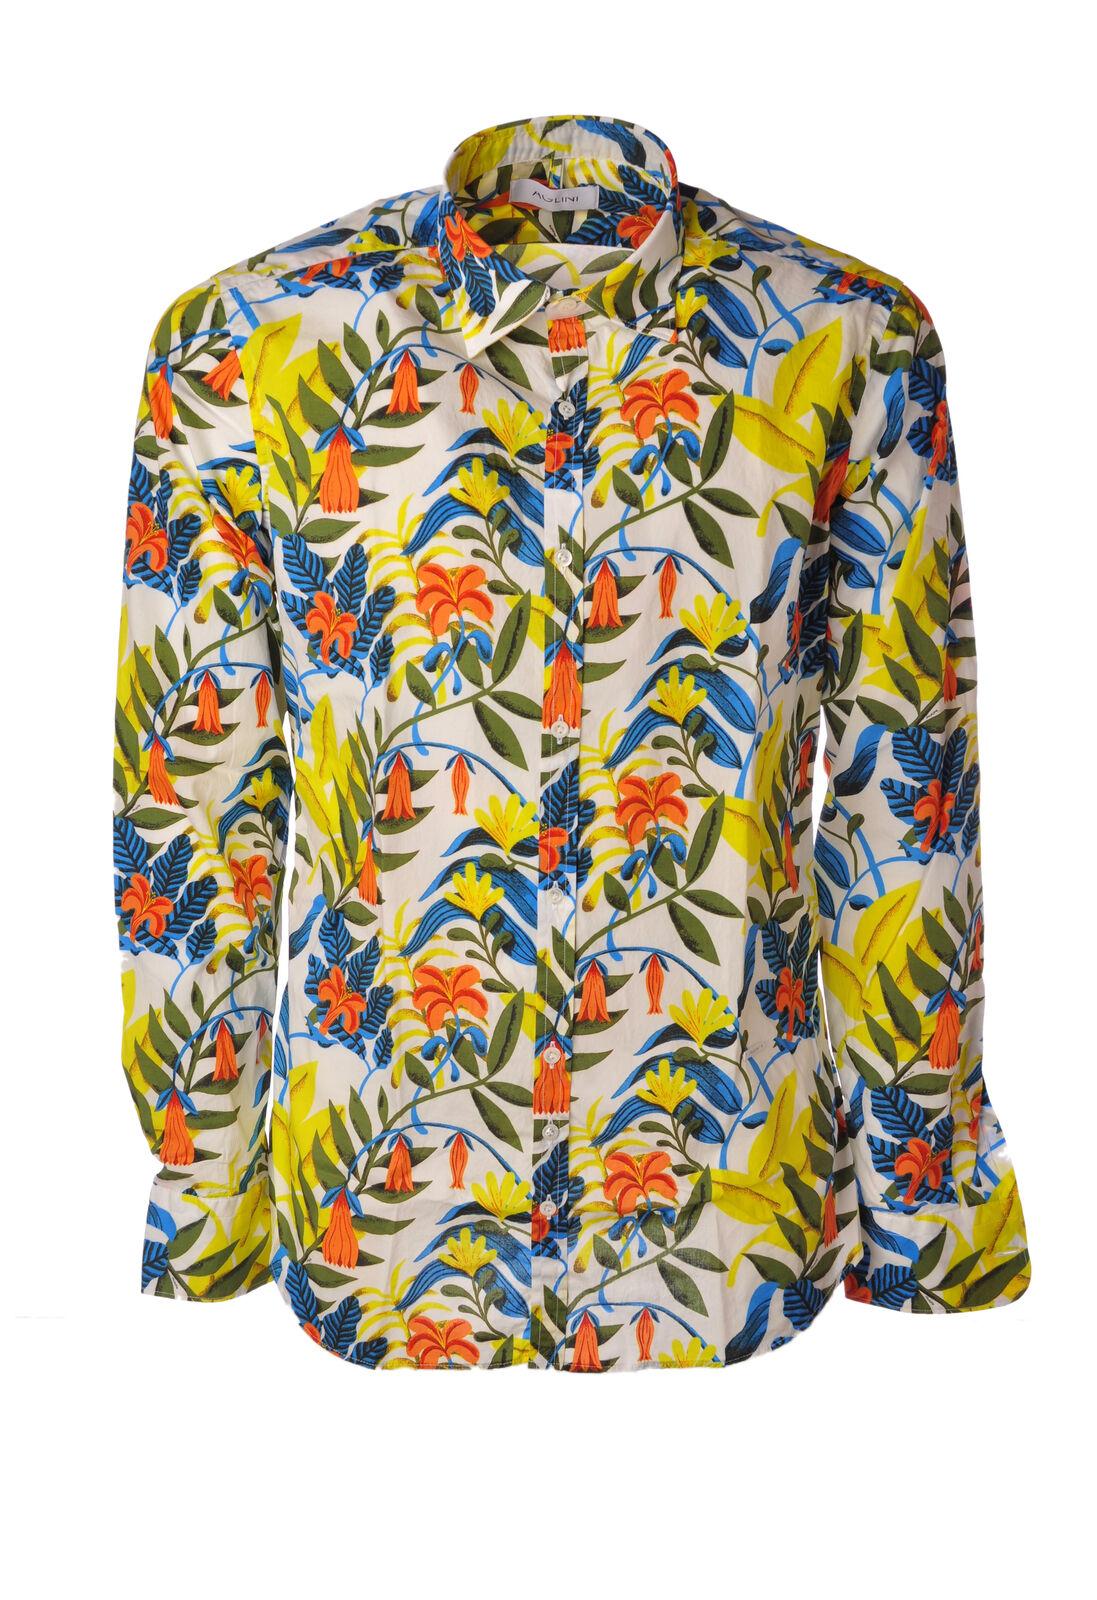 Aglini - bluesen-Shirt - Mann - Fantasie - 4997205G183926